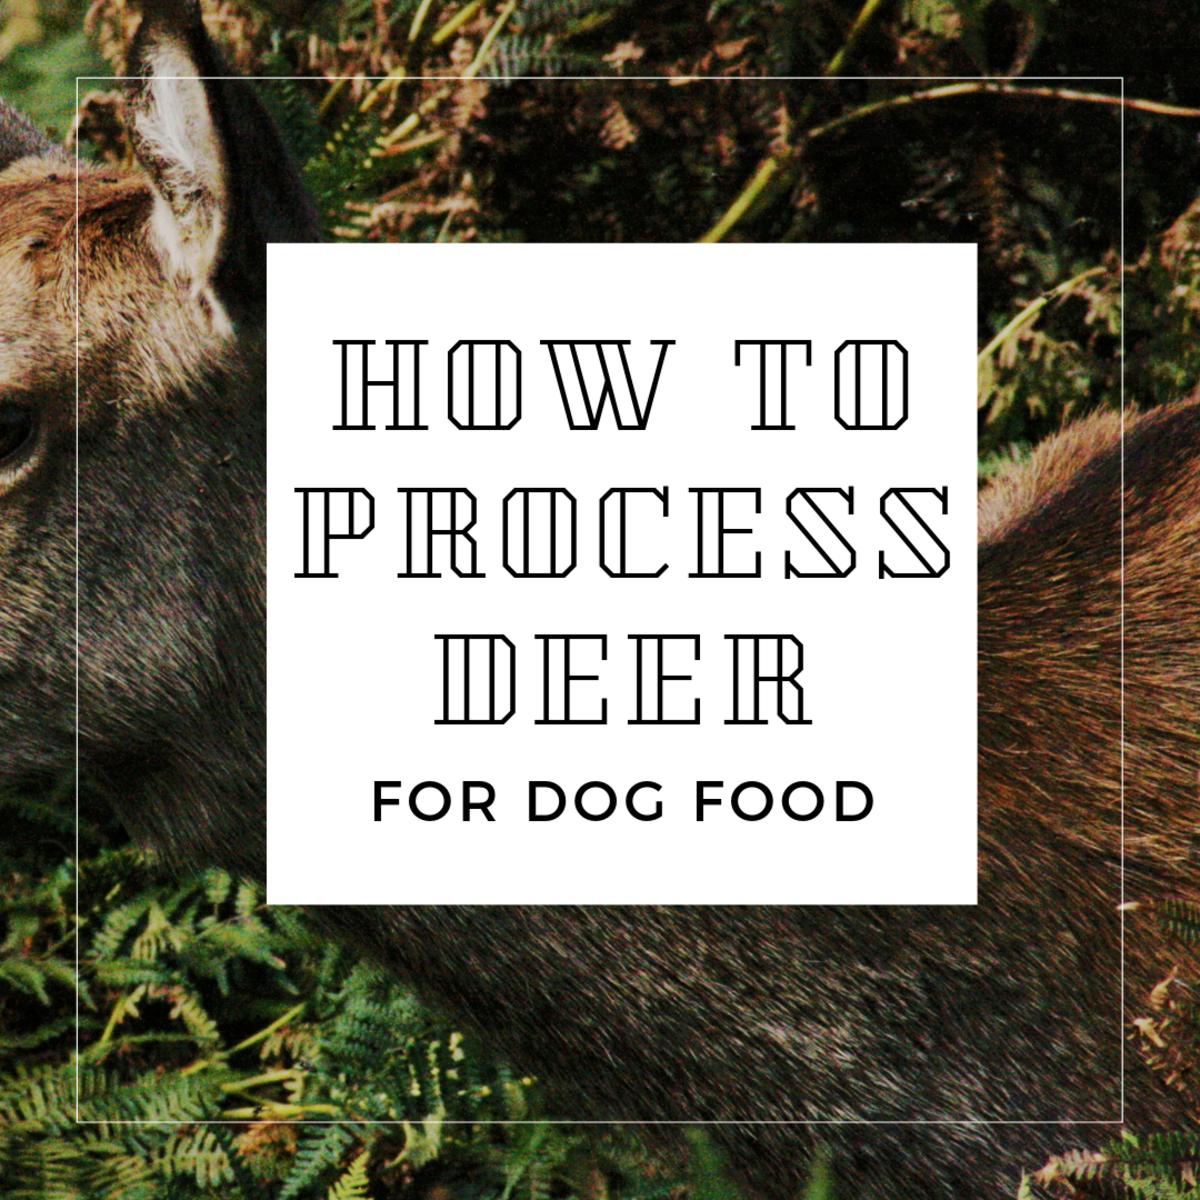 Processing Deer for Food